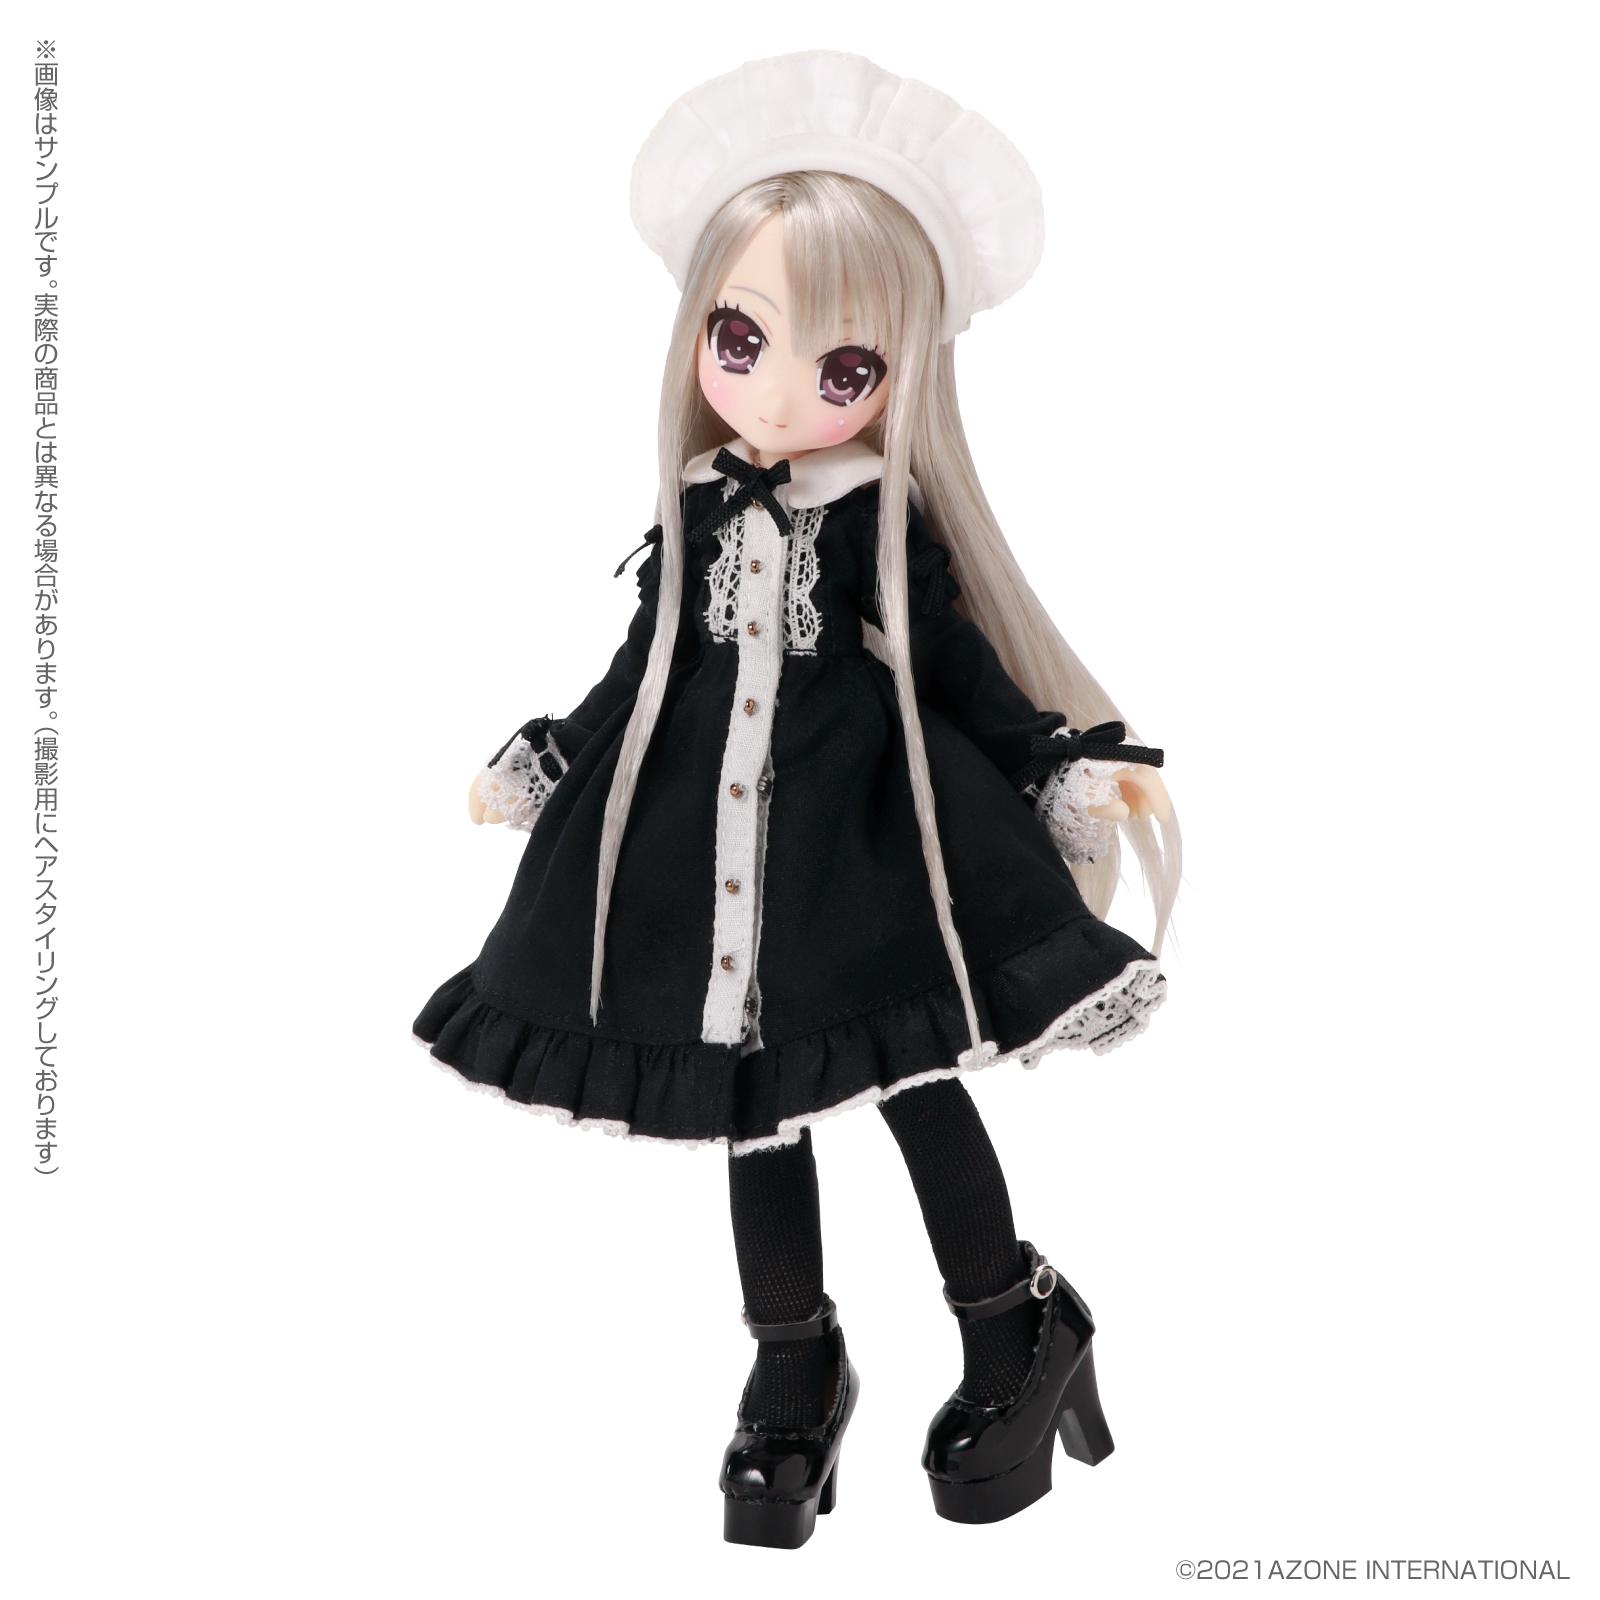 Lil'Fairy ~ちいさなお手伝いさん~『ヴェル 7th anniv.(ノーマル口ver.)』1/12 完成品ドール-009